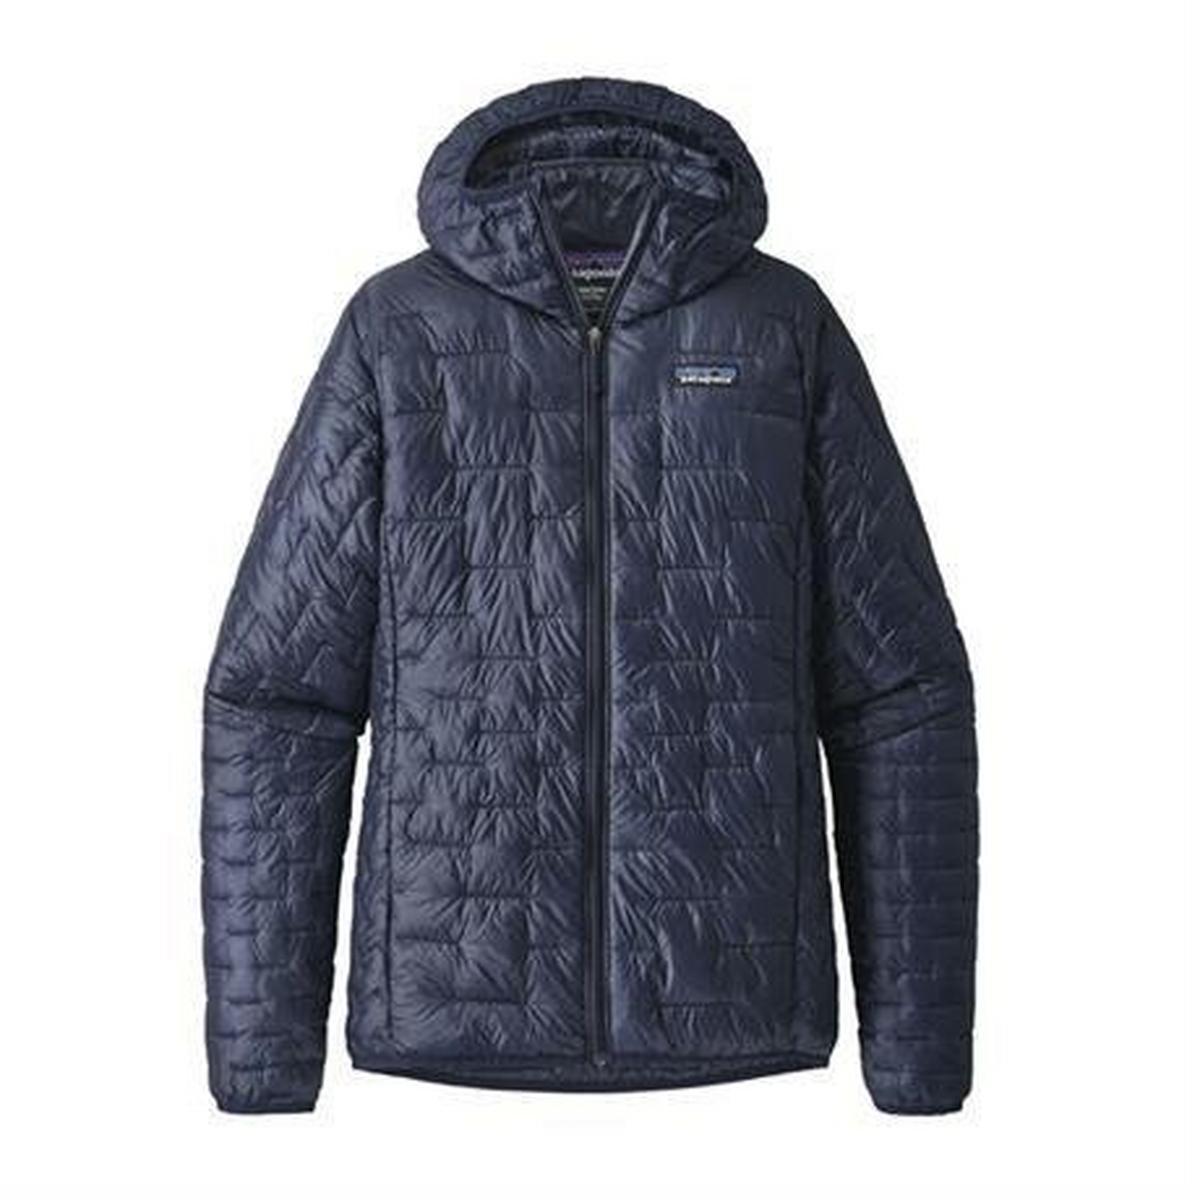 Patagonia INSULATED Jacket Women's Micro Puff Hoody Classic Navy